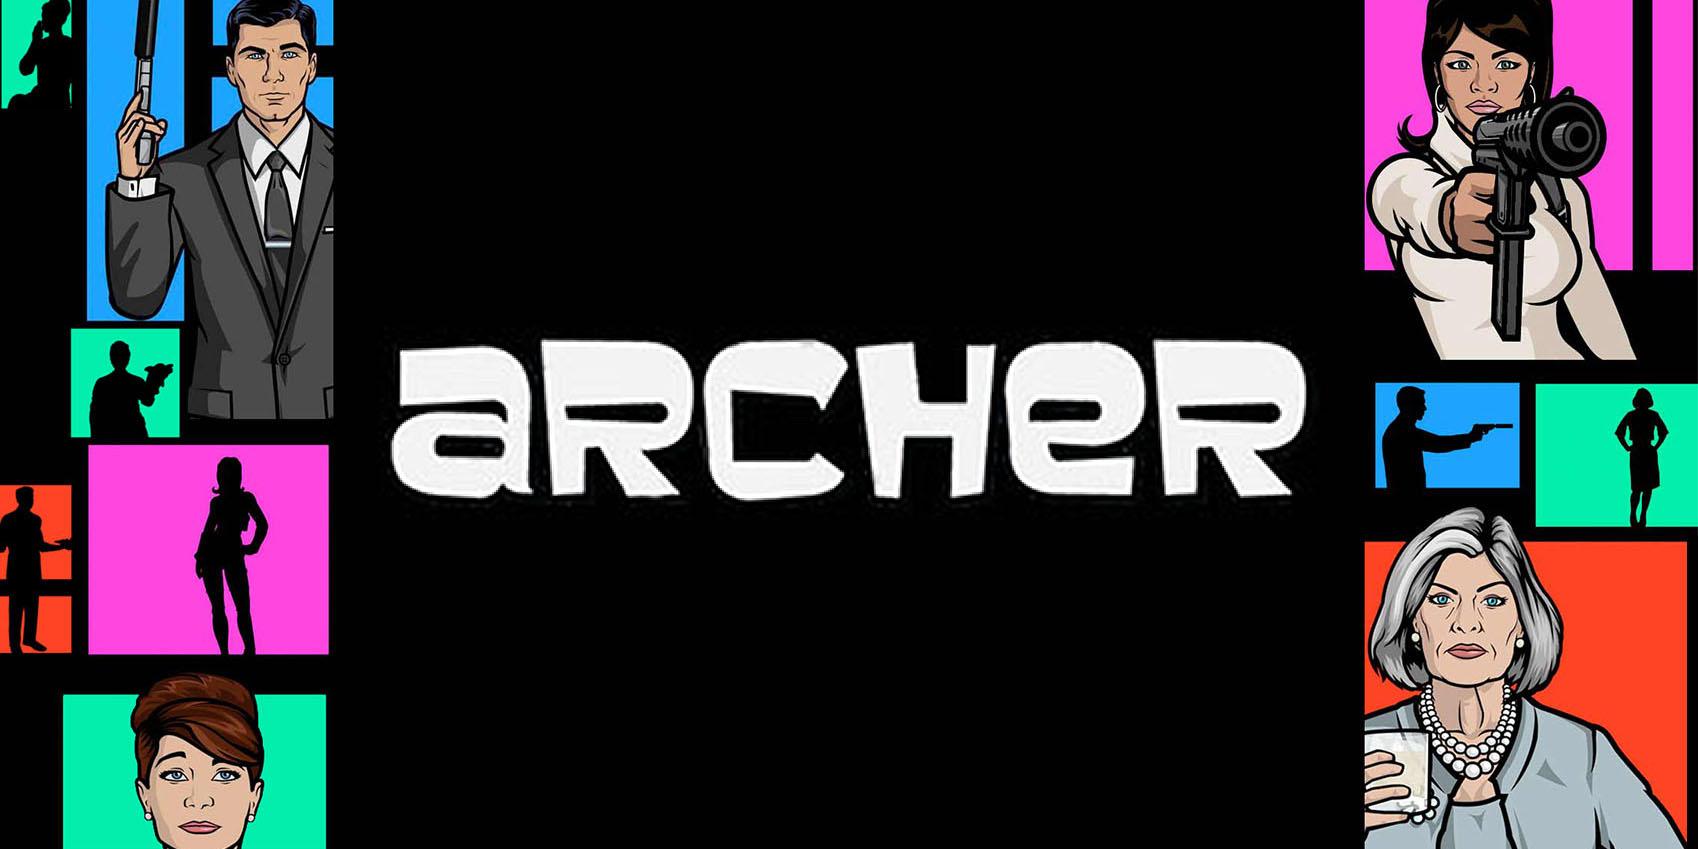 archer-sorozat